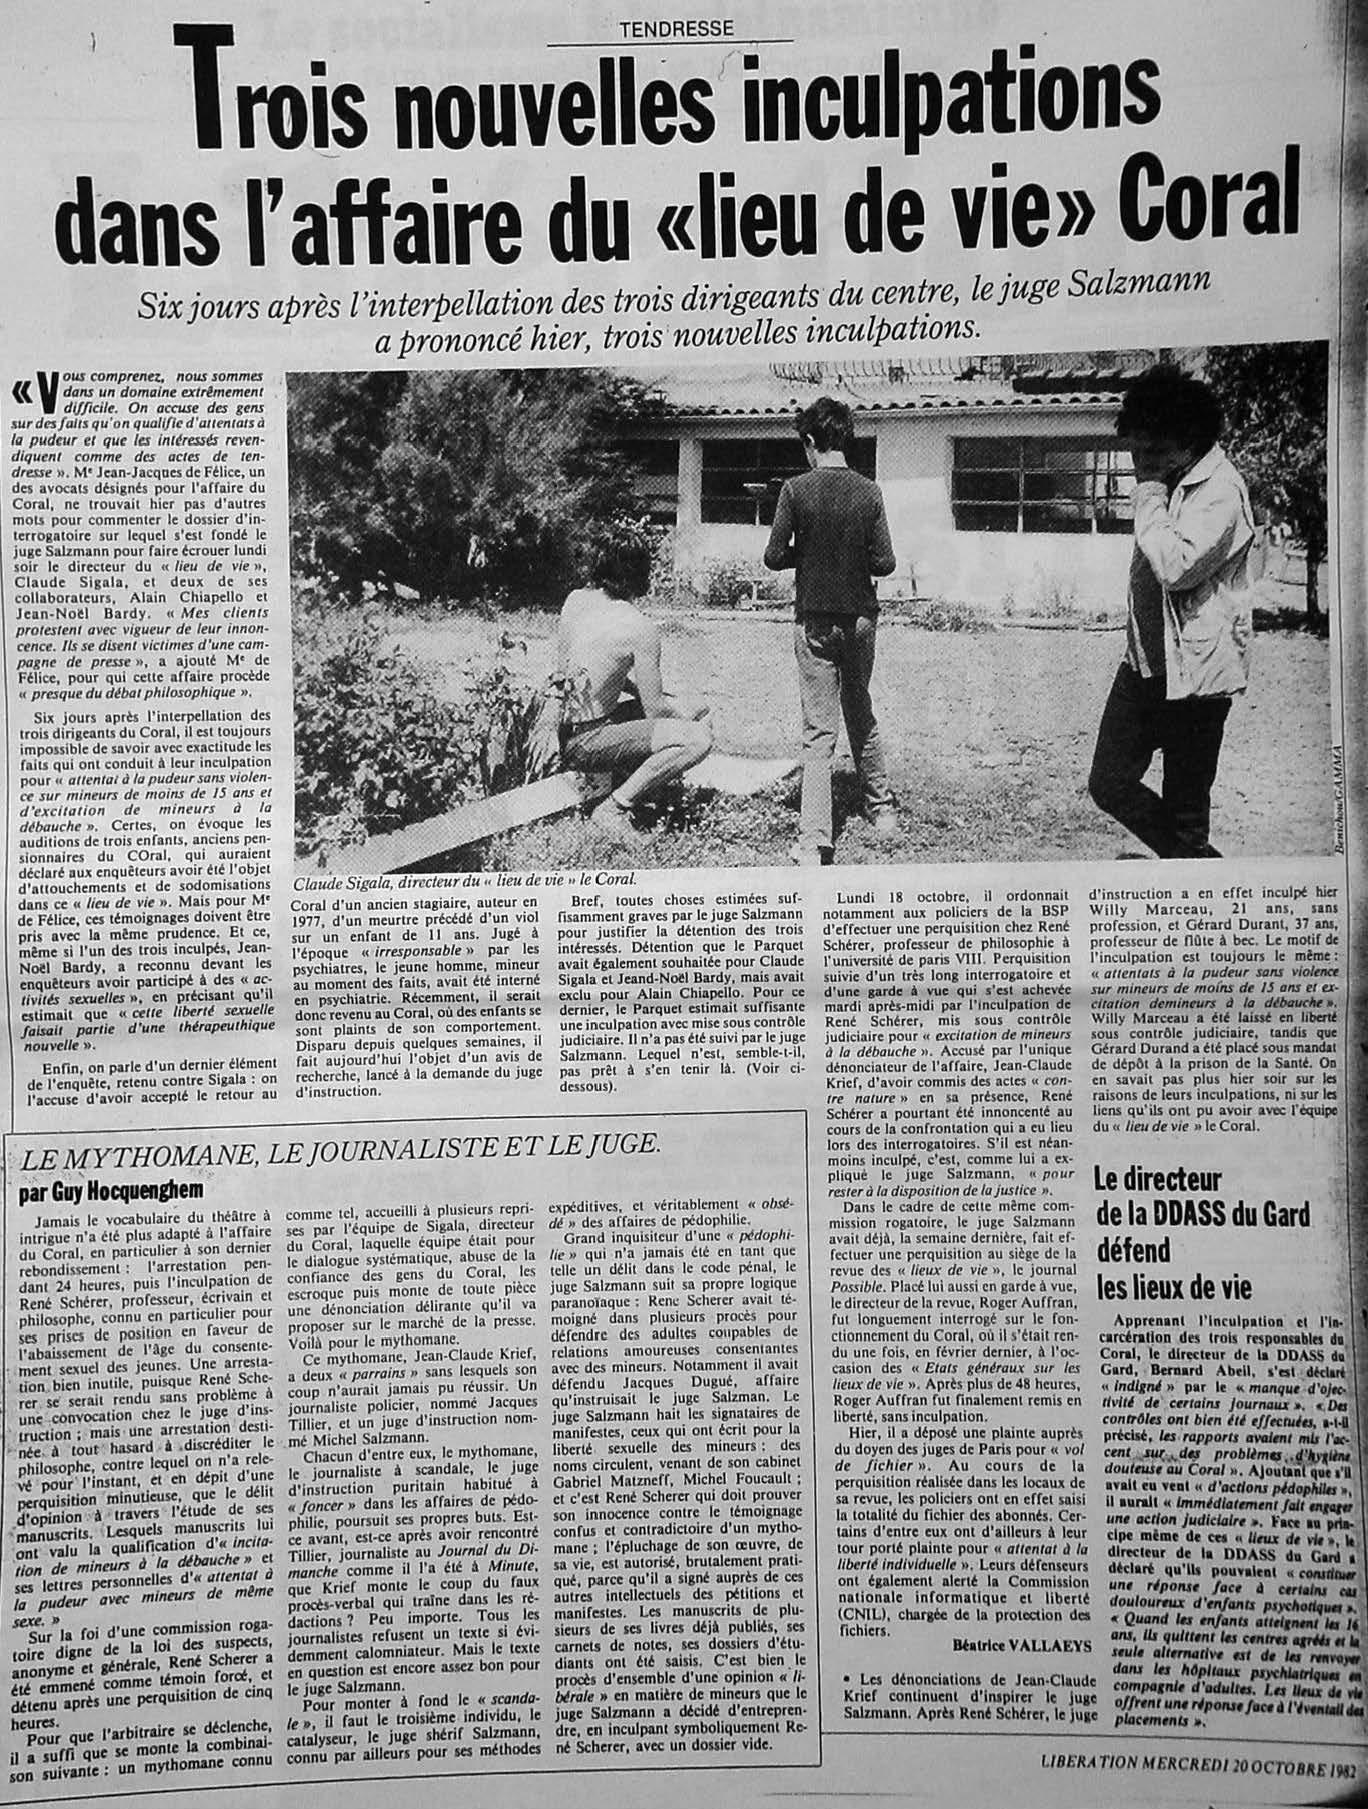 http://www.the-savoisien.com/blog/public/img5/pedophilie_affaire_Coral.jpg